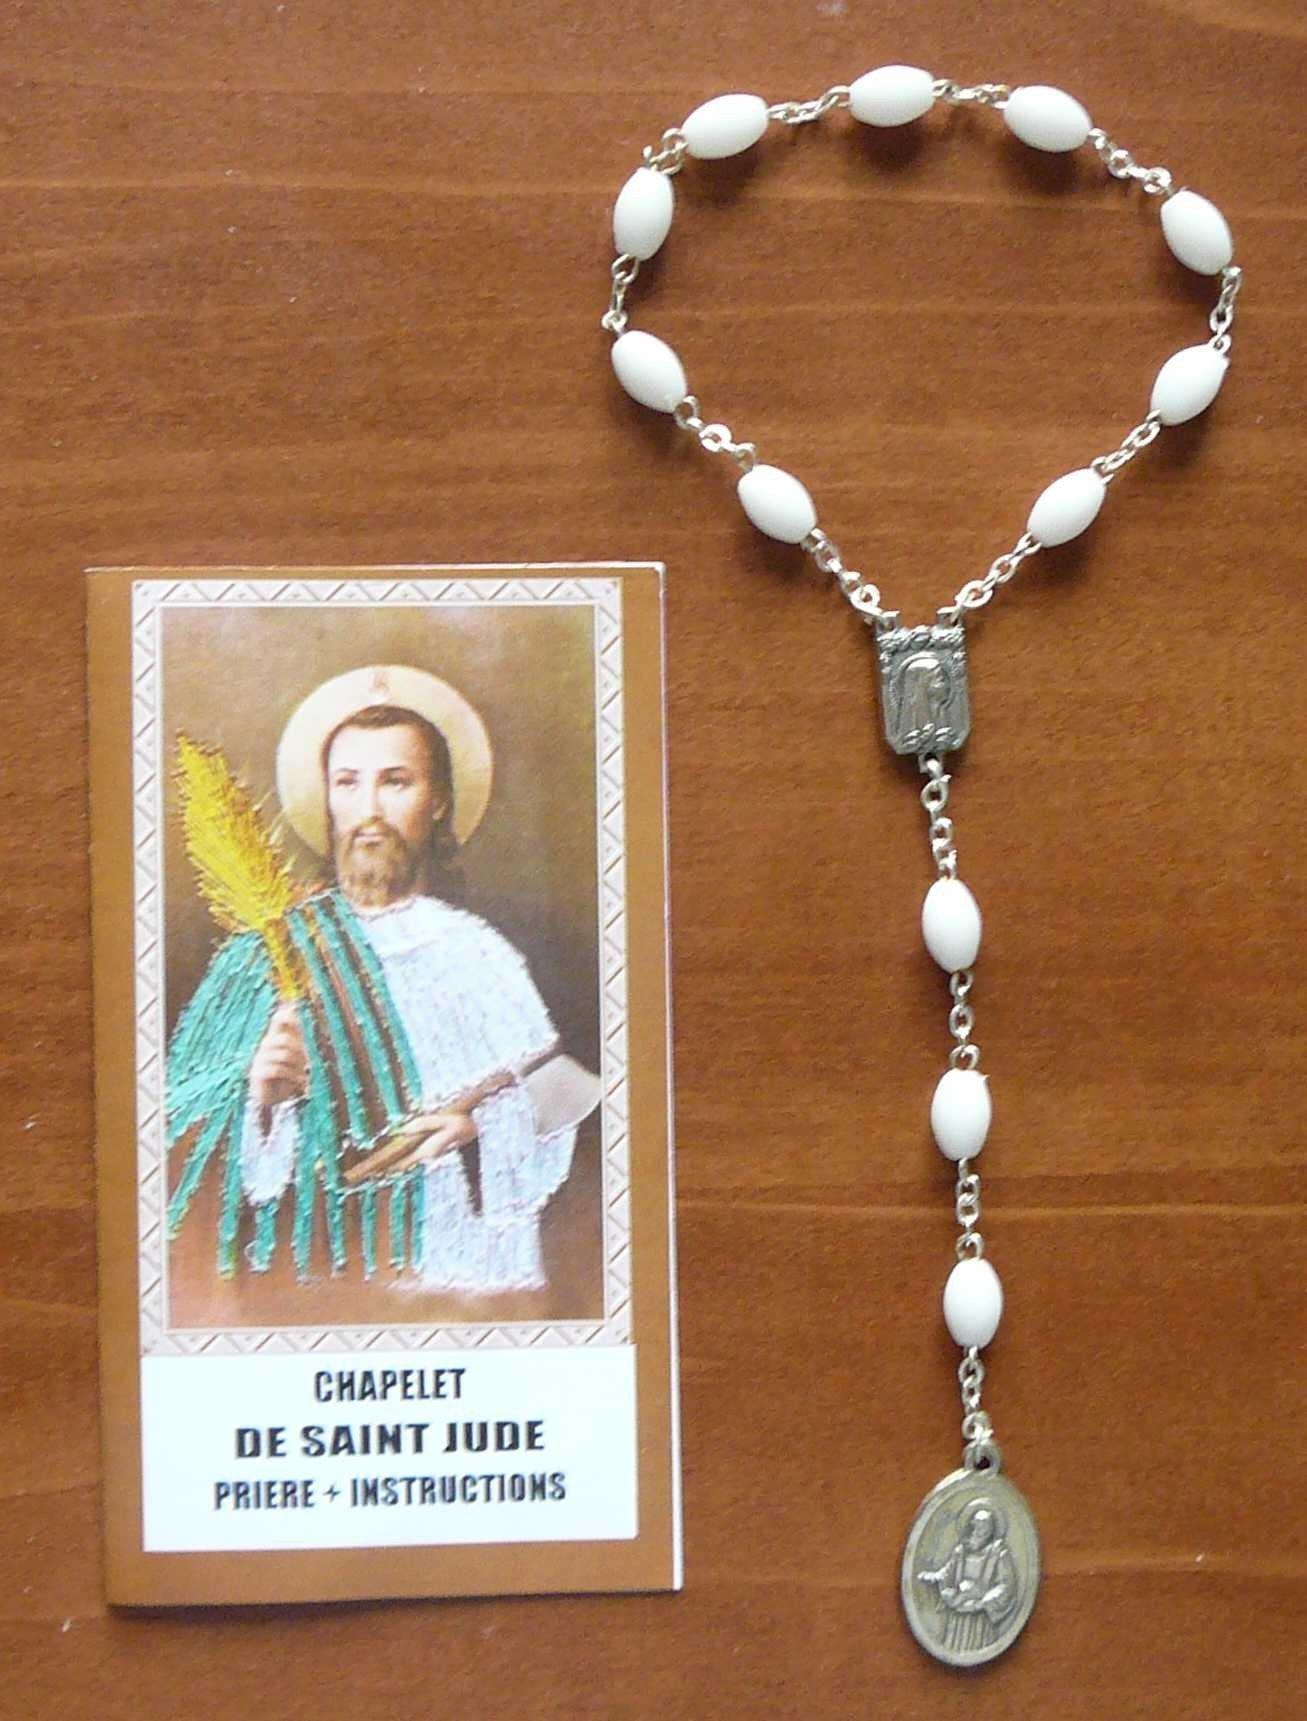 Chapelet de saint Jude